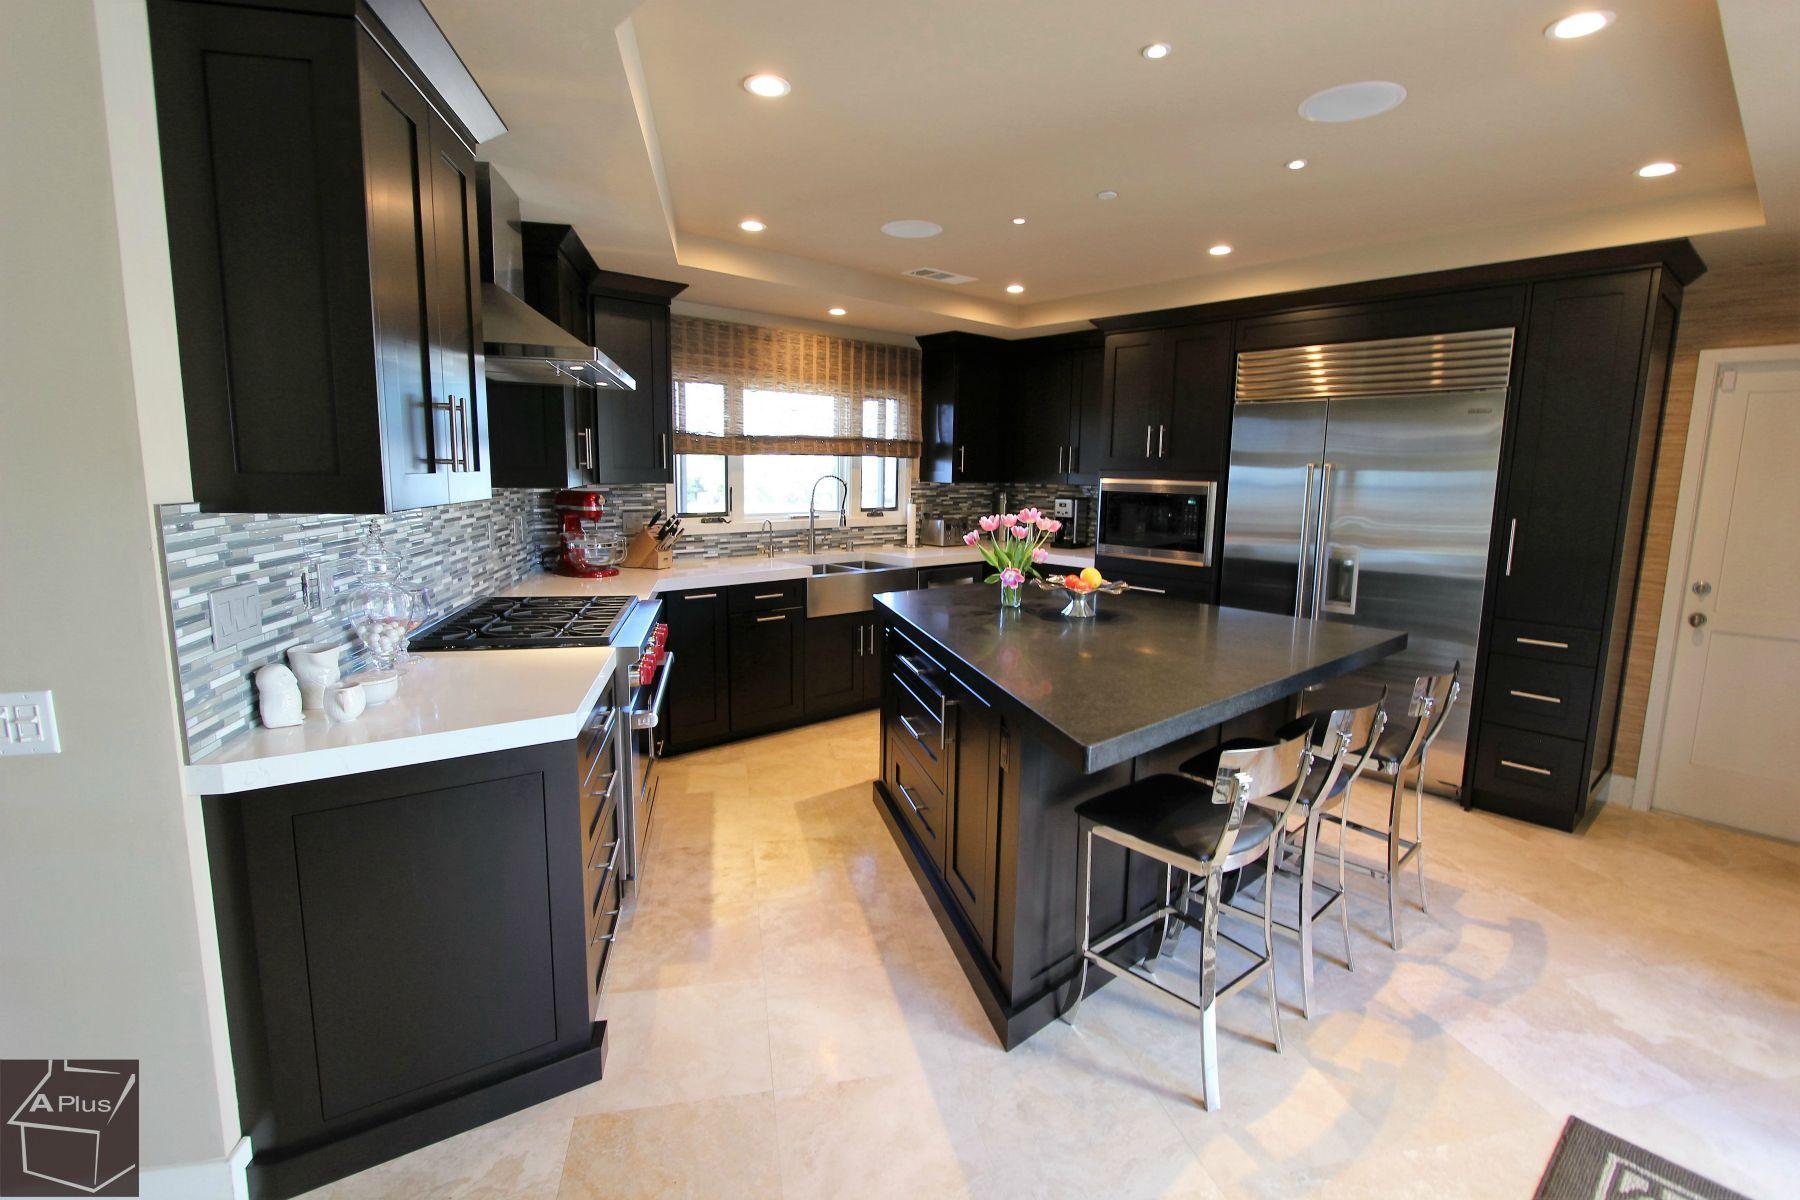 Superior Design Build Transitional Kitchen Remodel In Dana Point Orange County